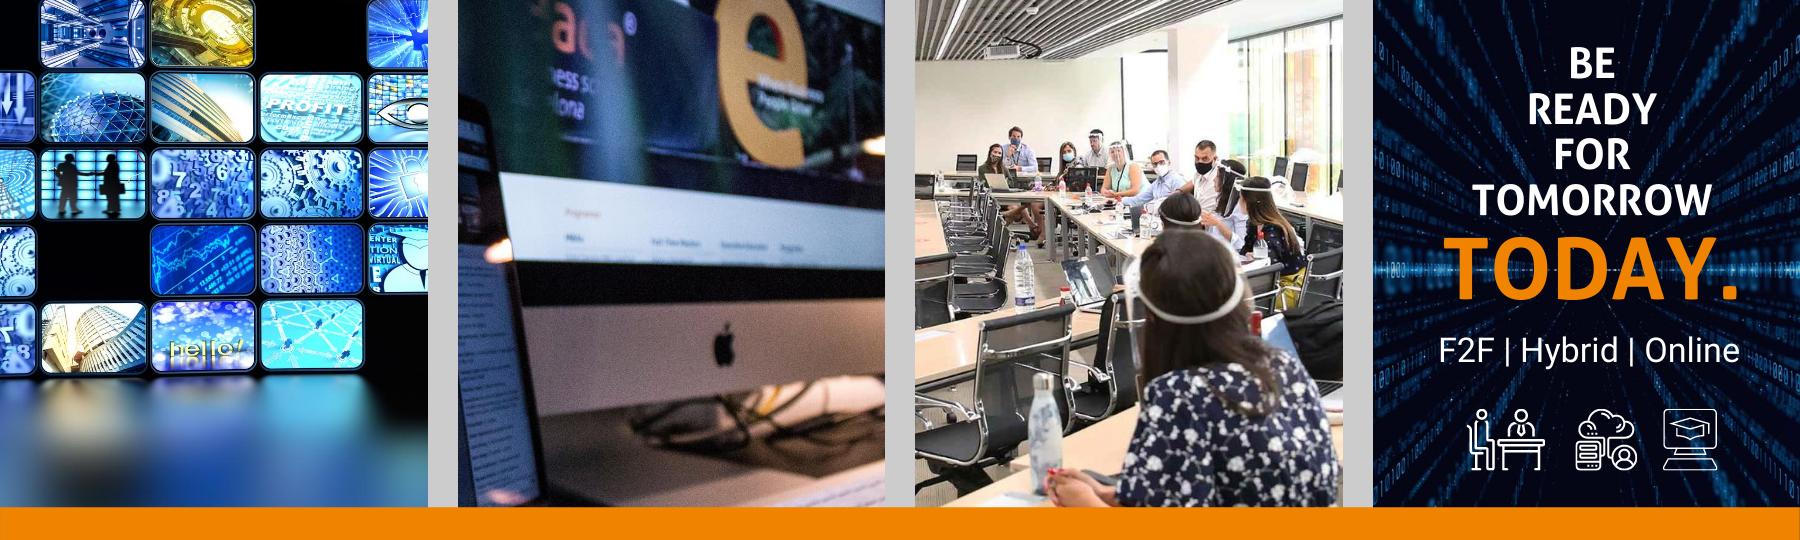 Immersive Learning EADA: F2F - Hybrid - Online